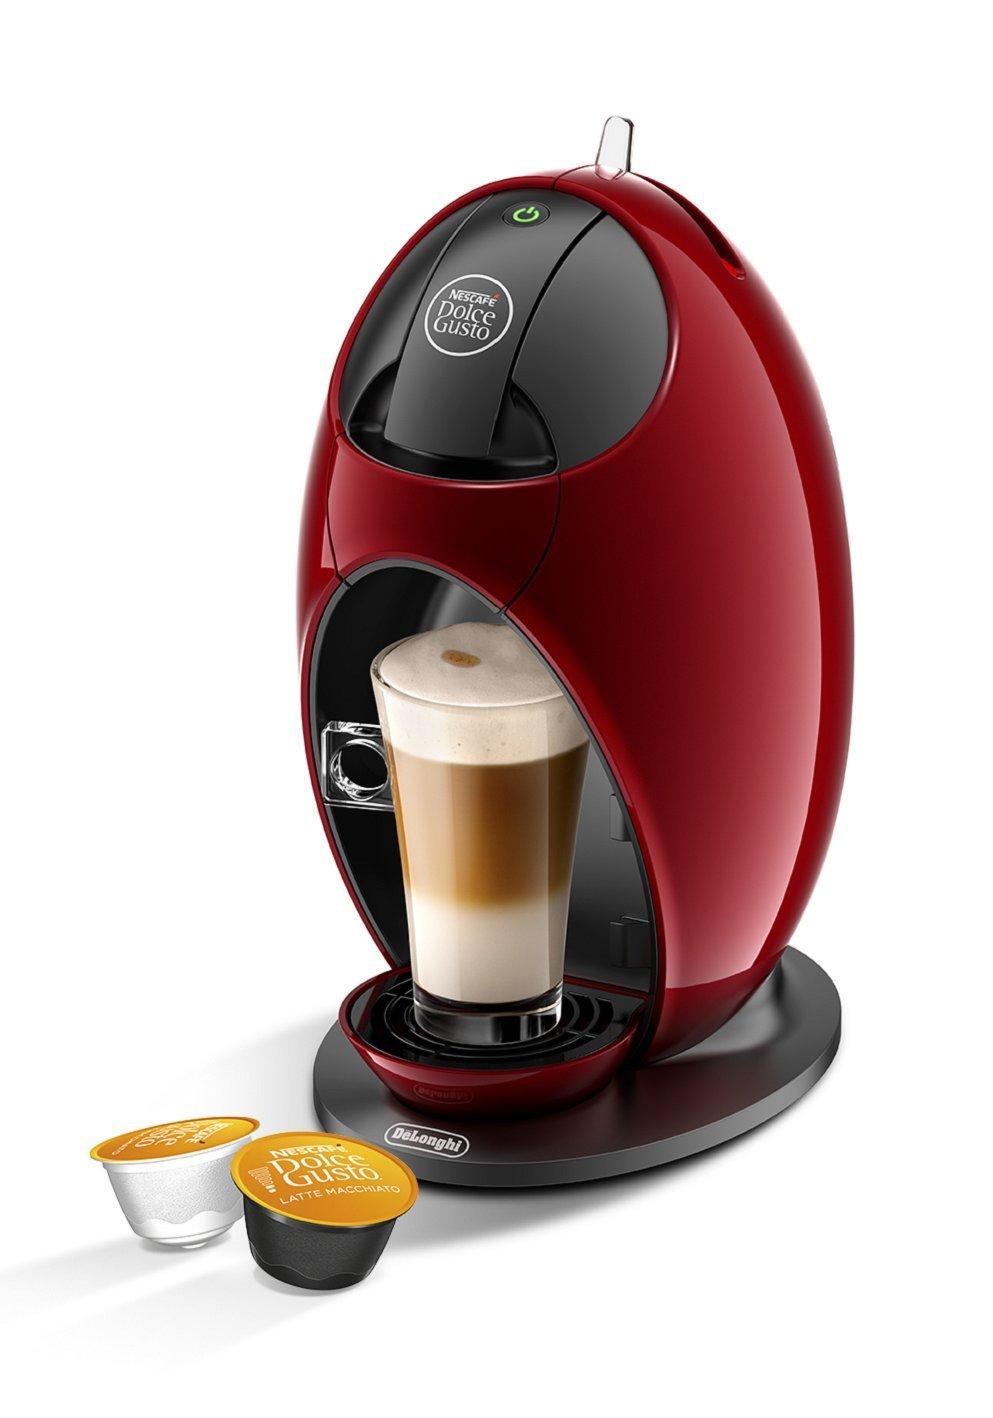 Maquina de cafe nescafe dolce gusto precio